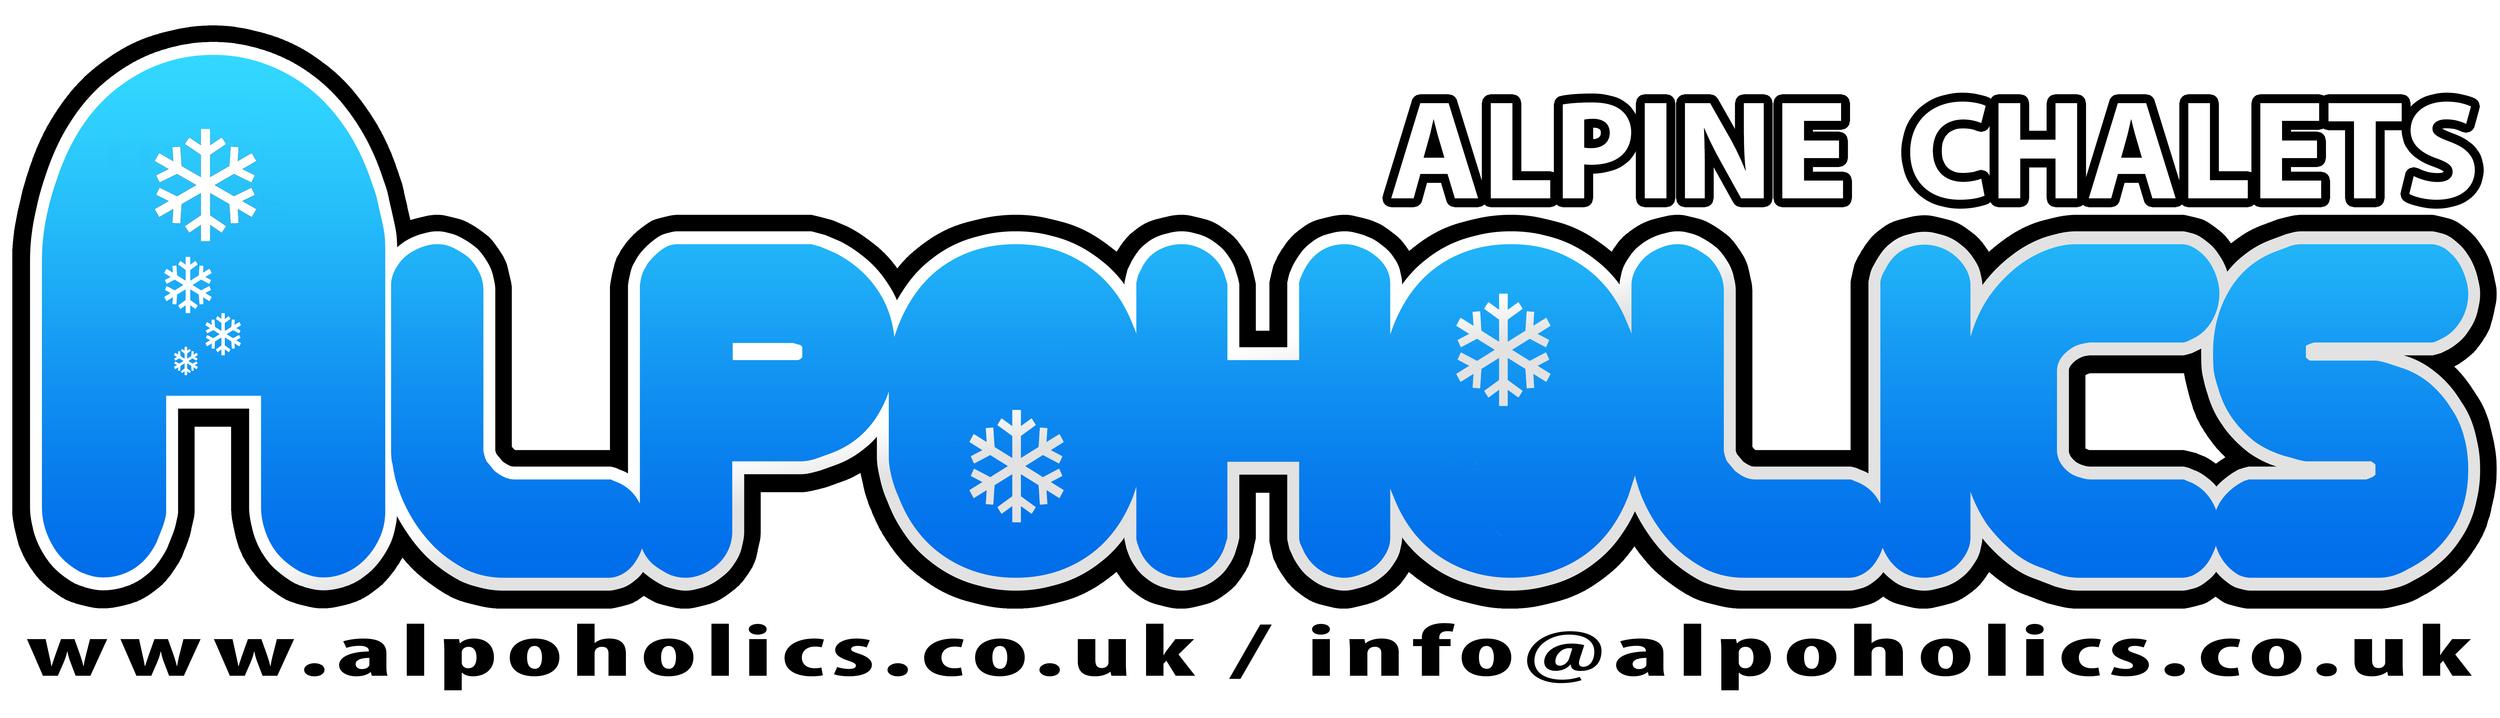 Alpoholics new logo with web & email.jpg